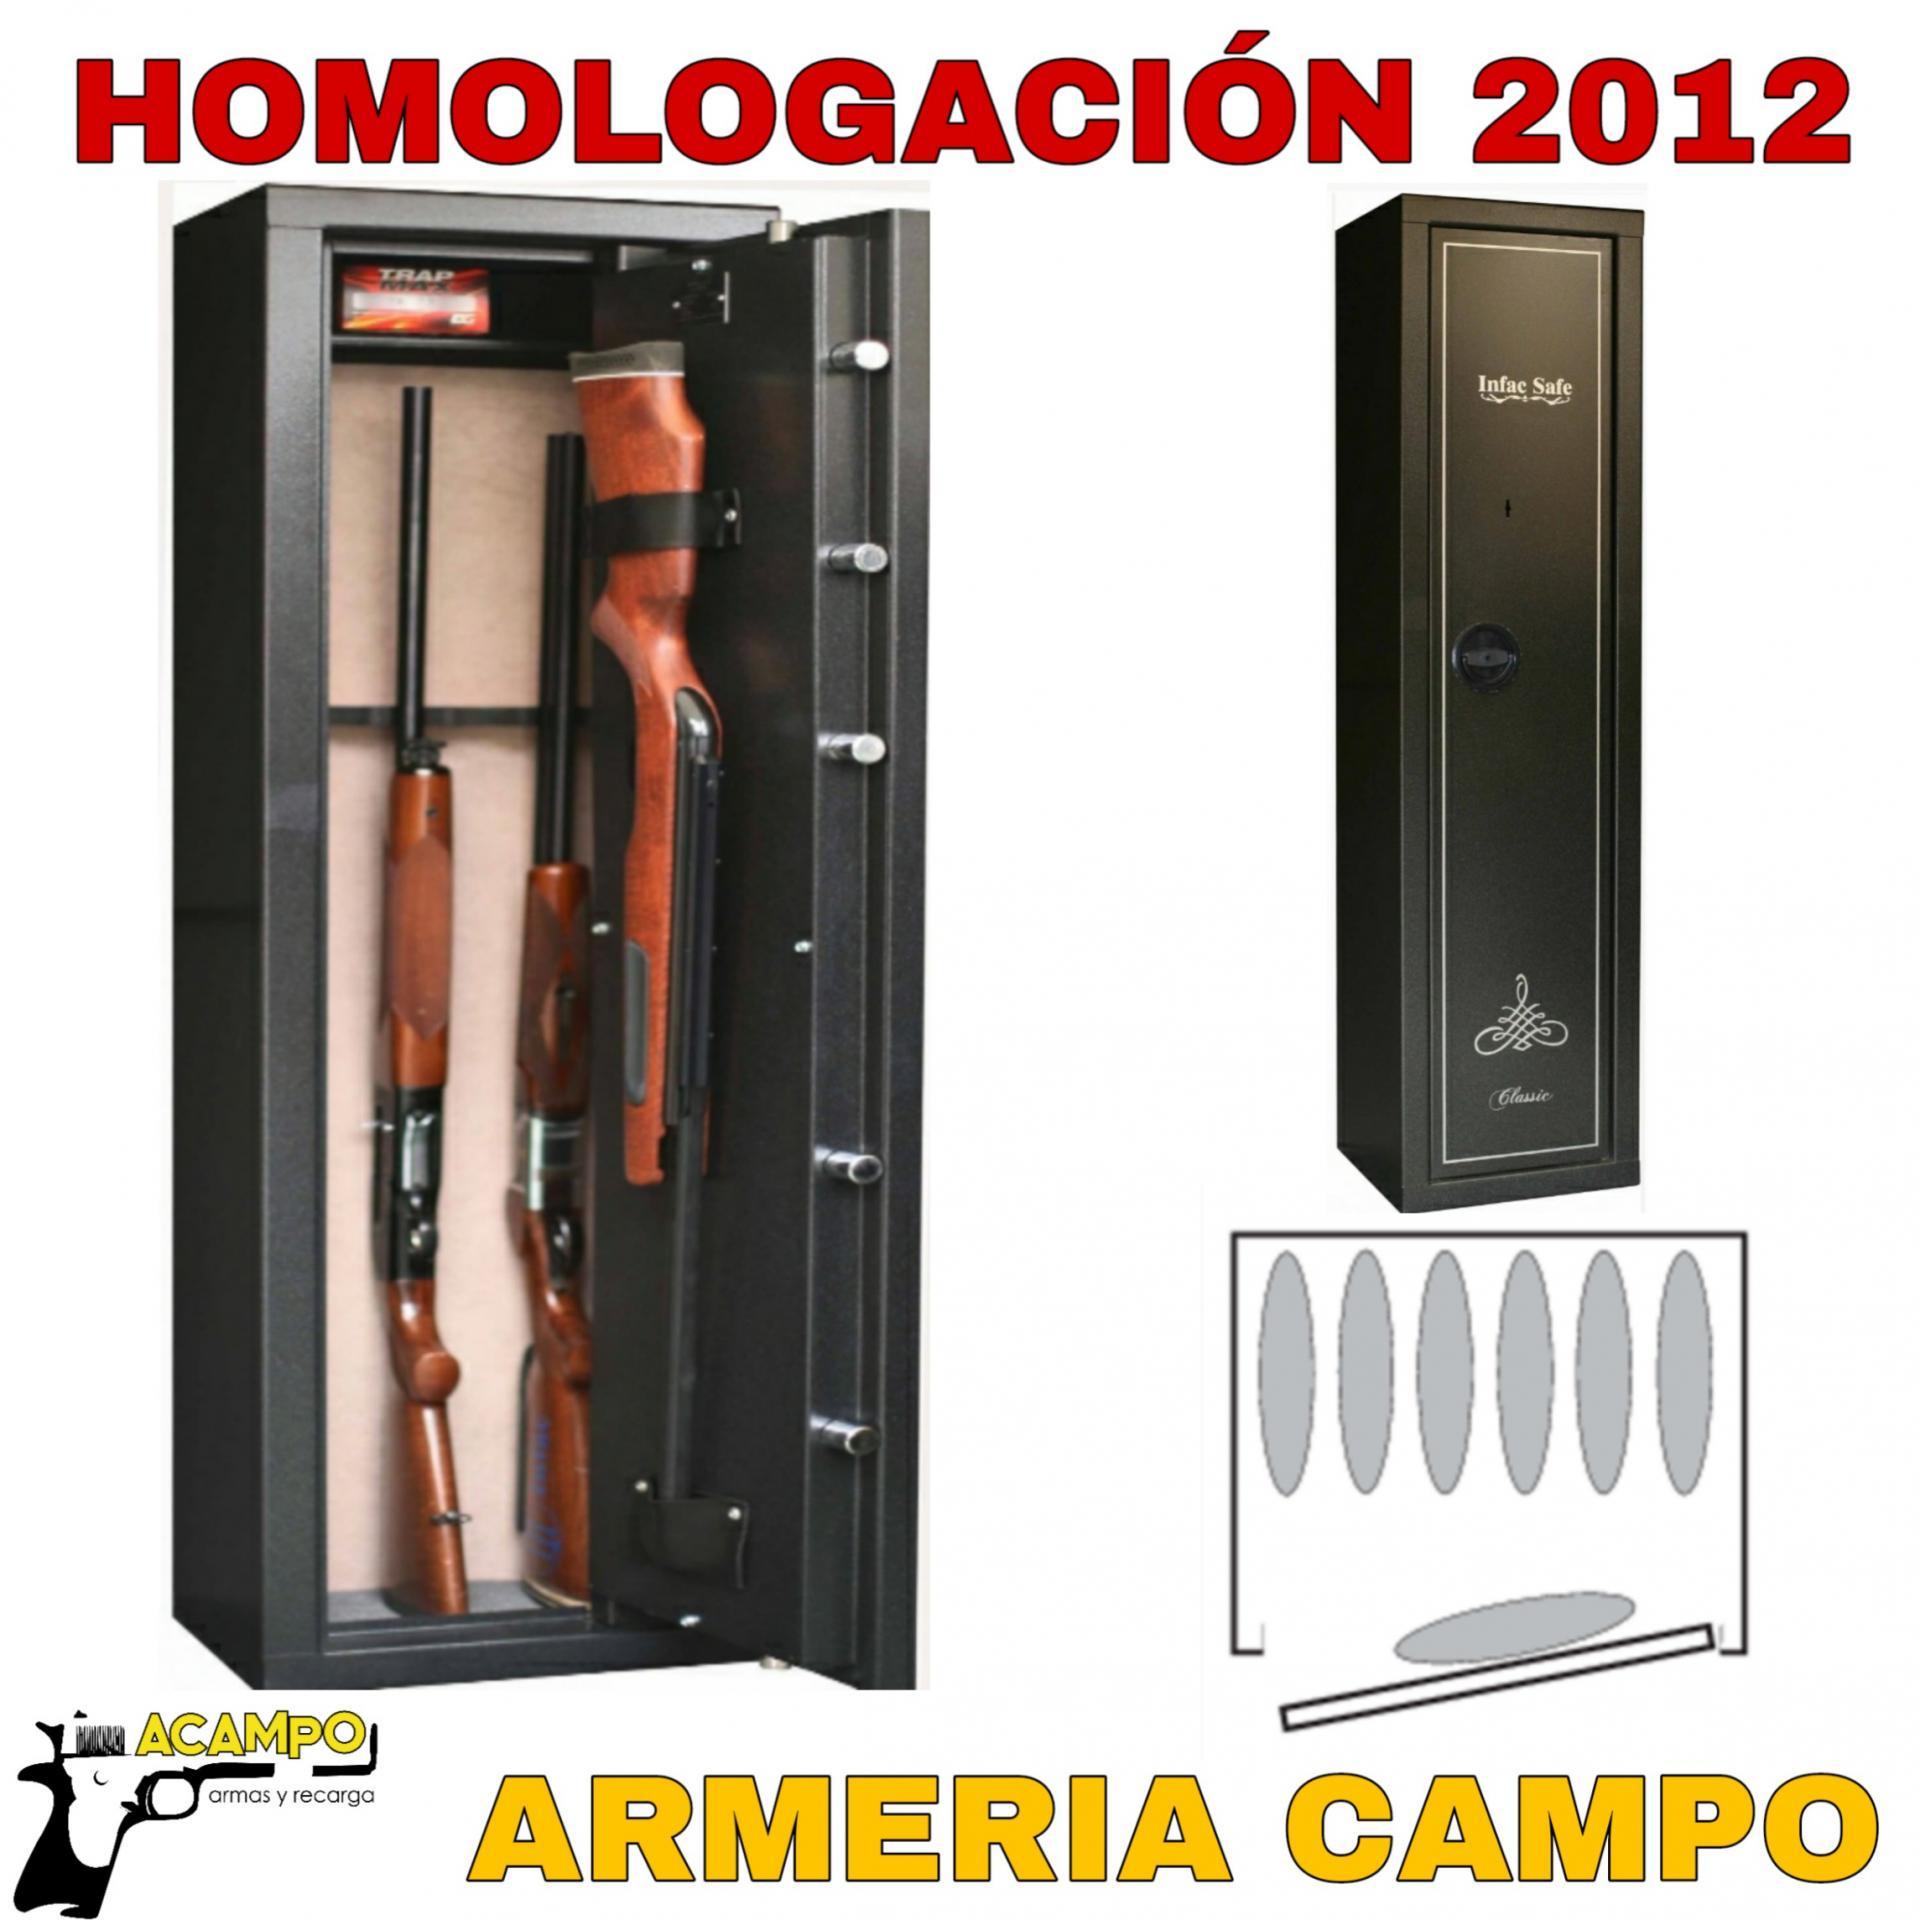 ARMERO INFAC MK7 - Grado I